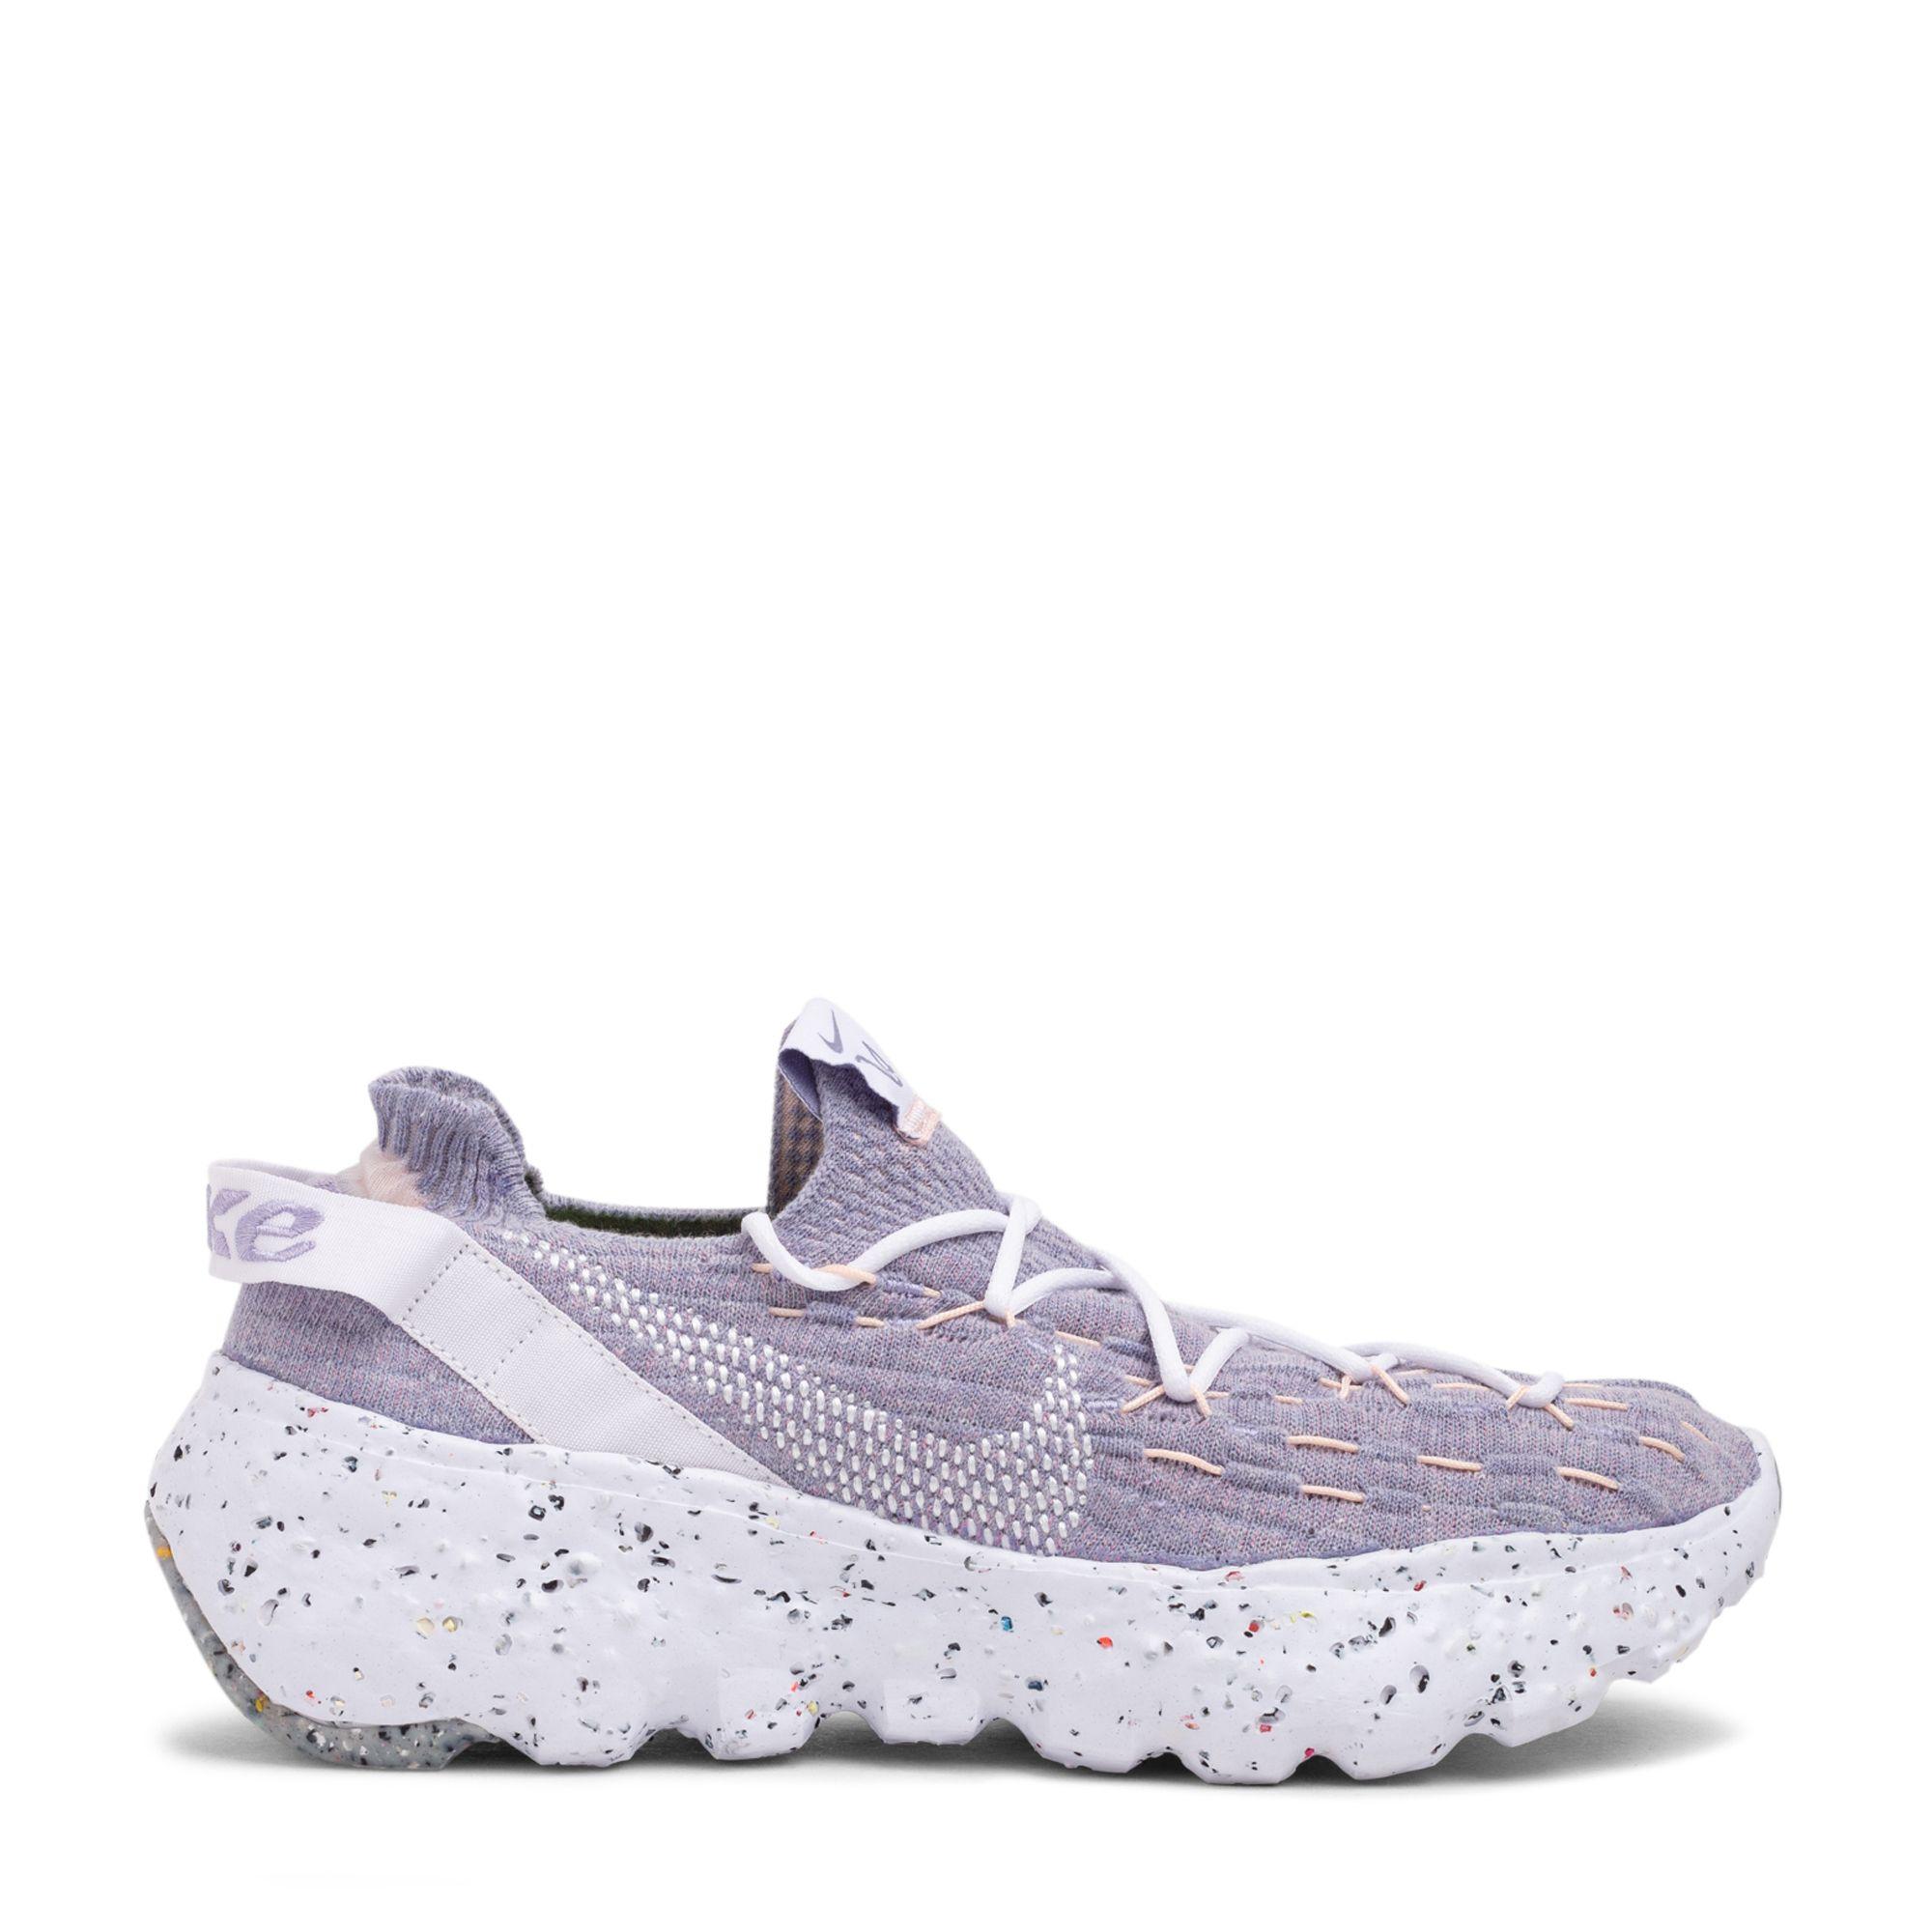 Space Hippie 04 sneakers